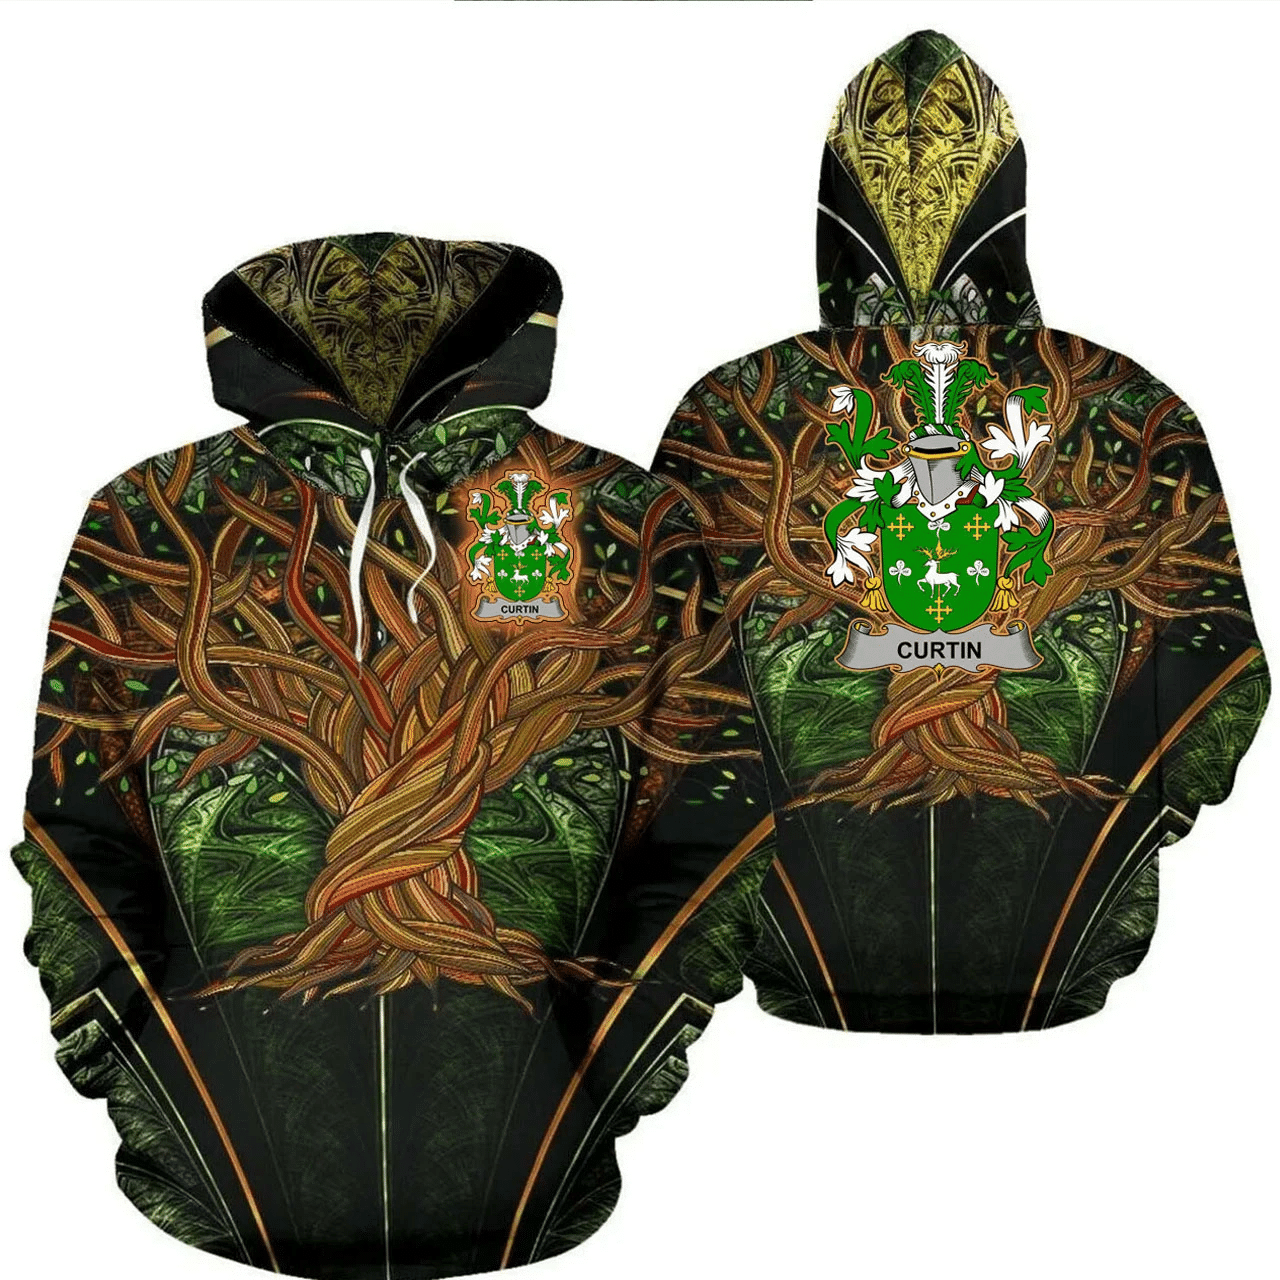 1stIreland Ireland Hoodie - Curtin or McCurtin Irish Family Crest Hoodie - Tree Of Life A7